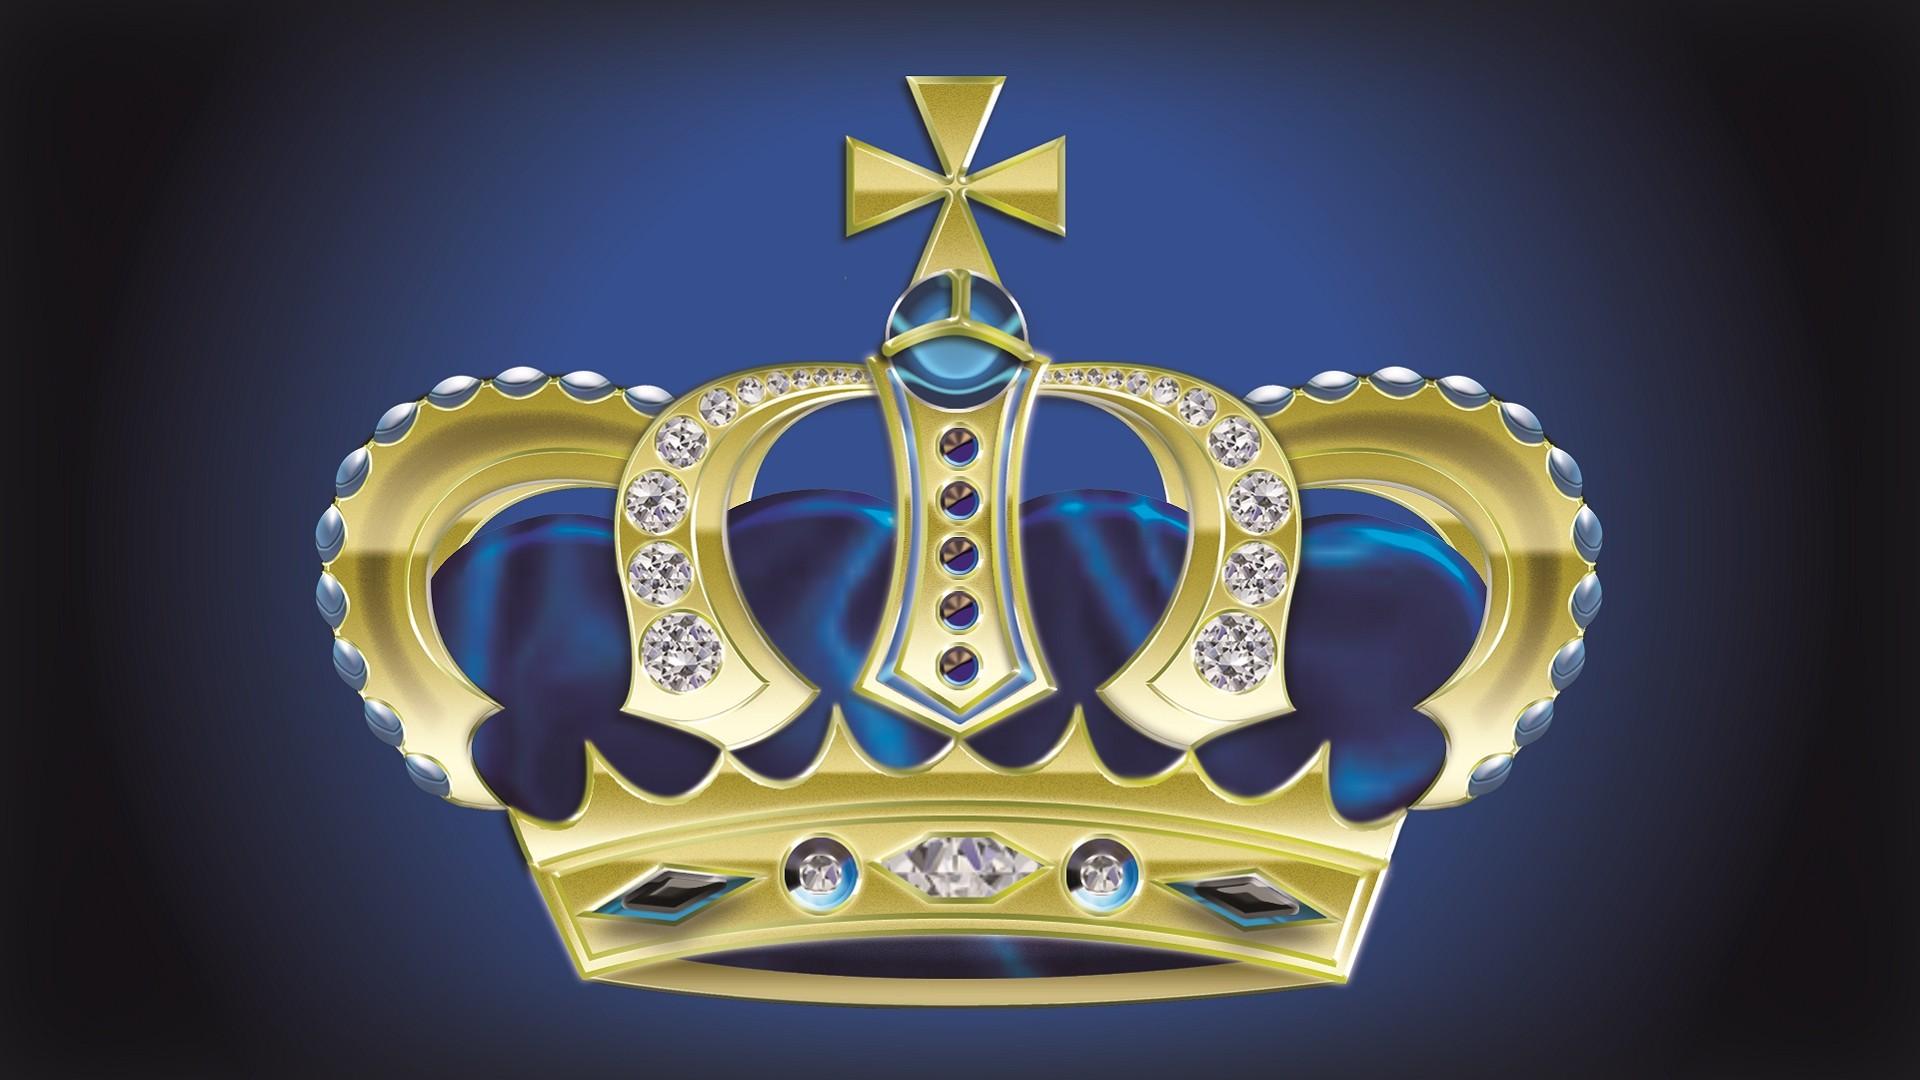 Crown Wallpaper image hd